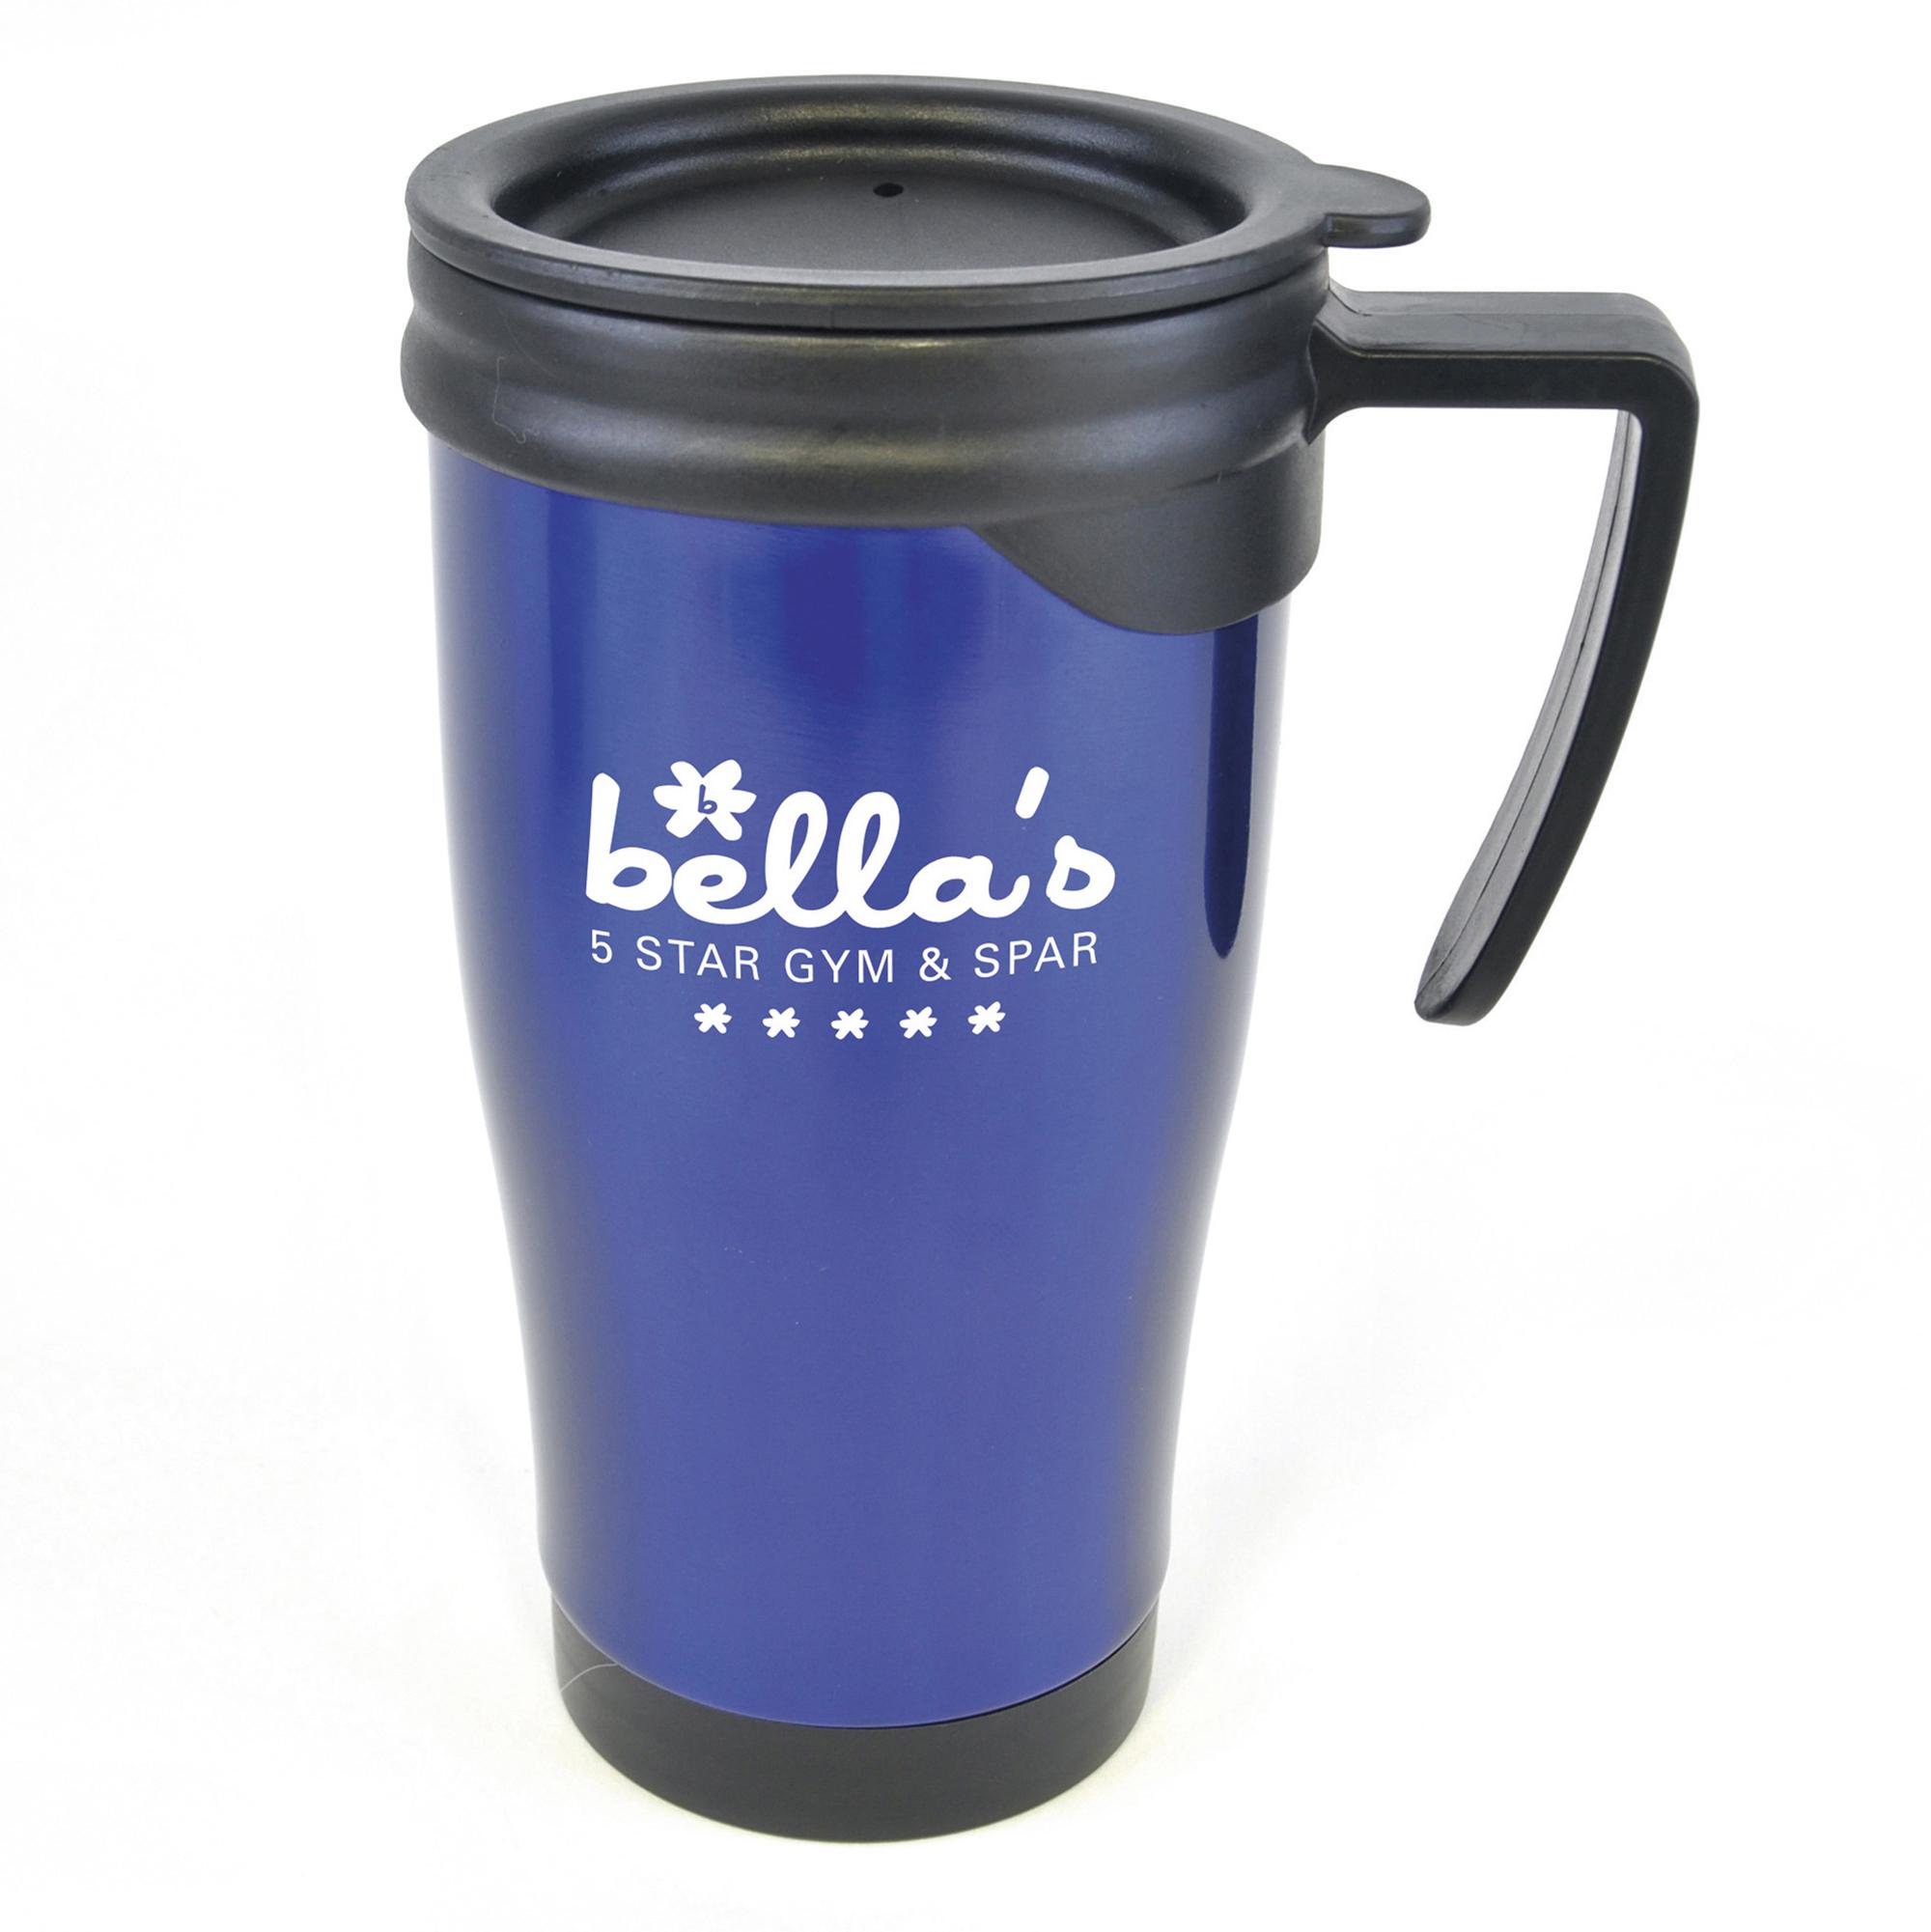 Promotional Dali Colour Travel Mugs